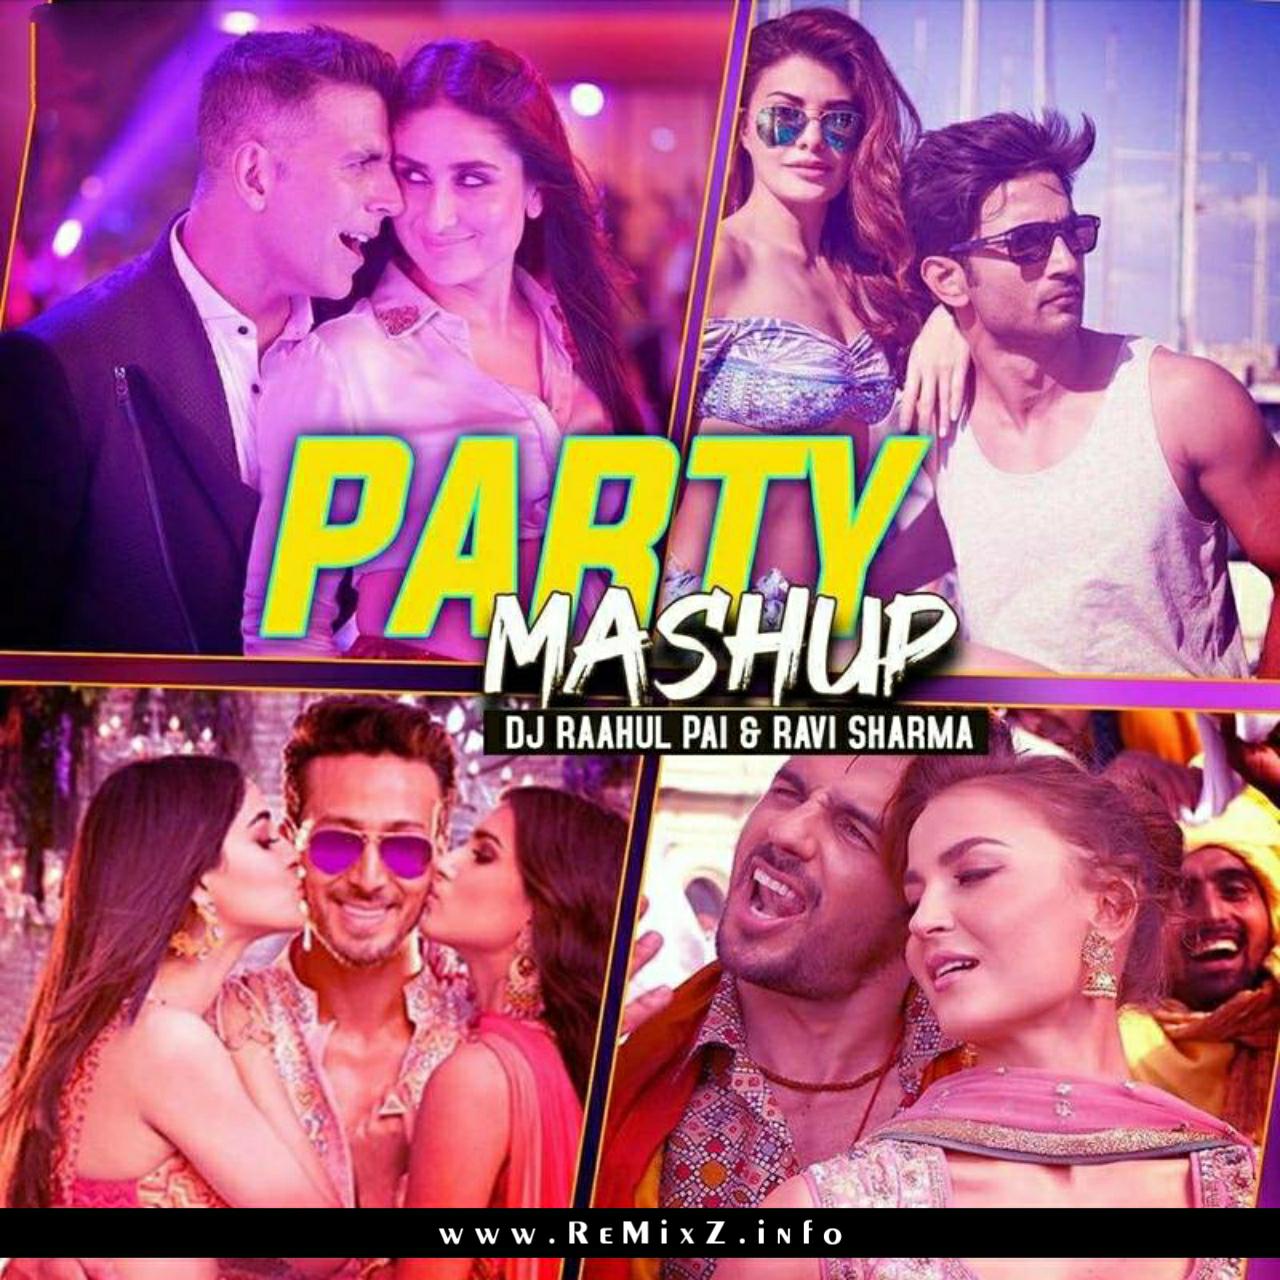 party-mashup-dj-raahul-pai-x-ravi-Sharma.jpg